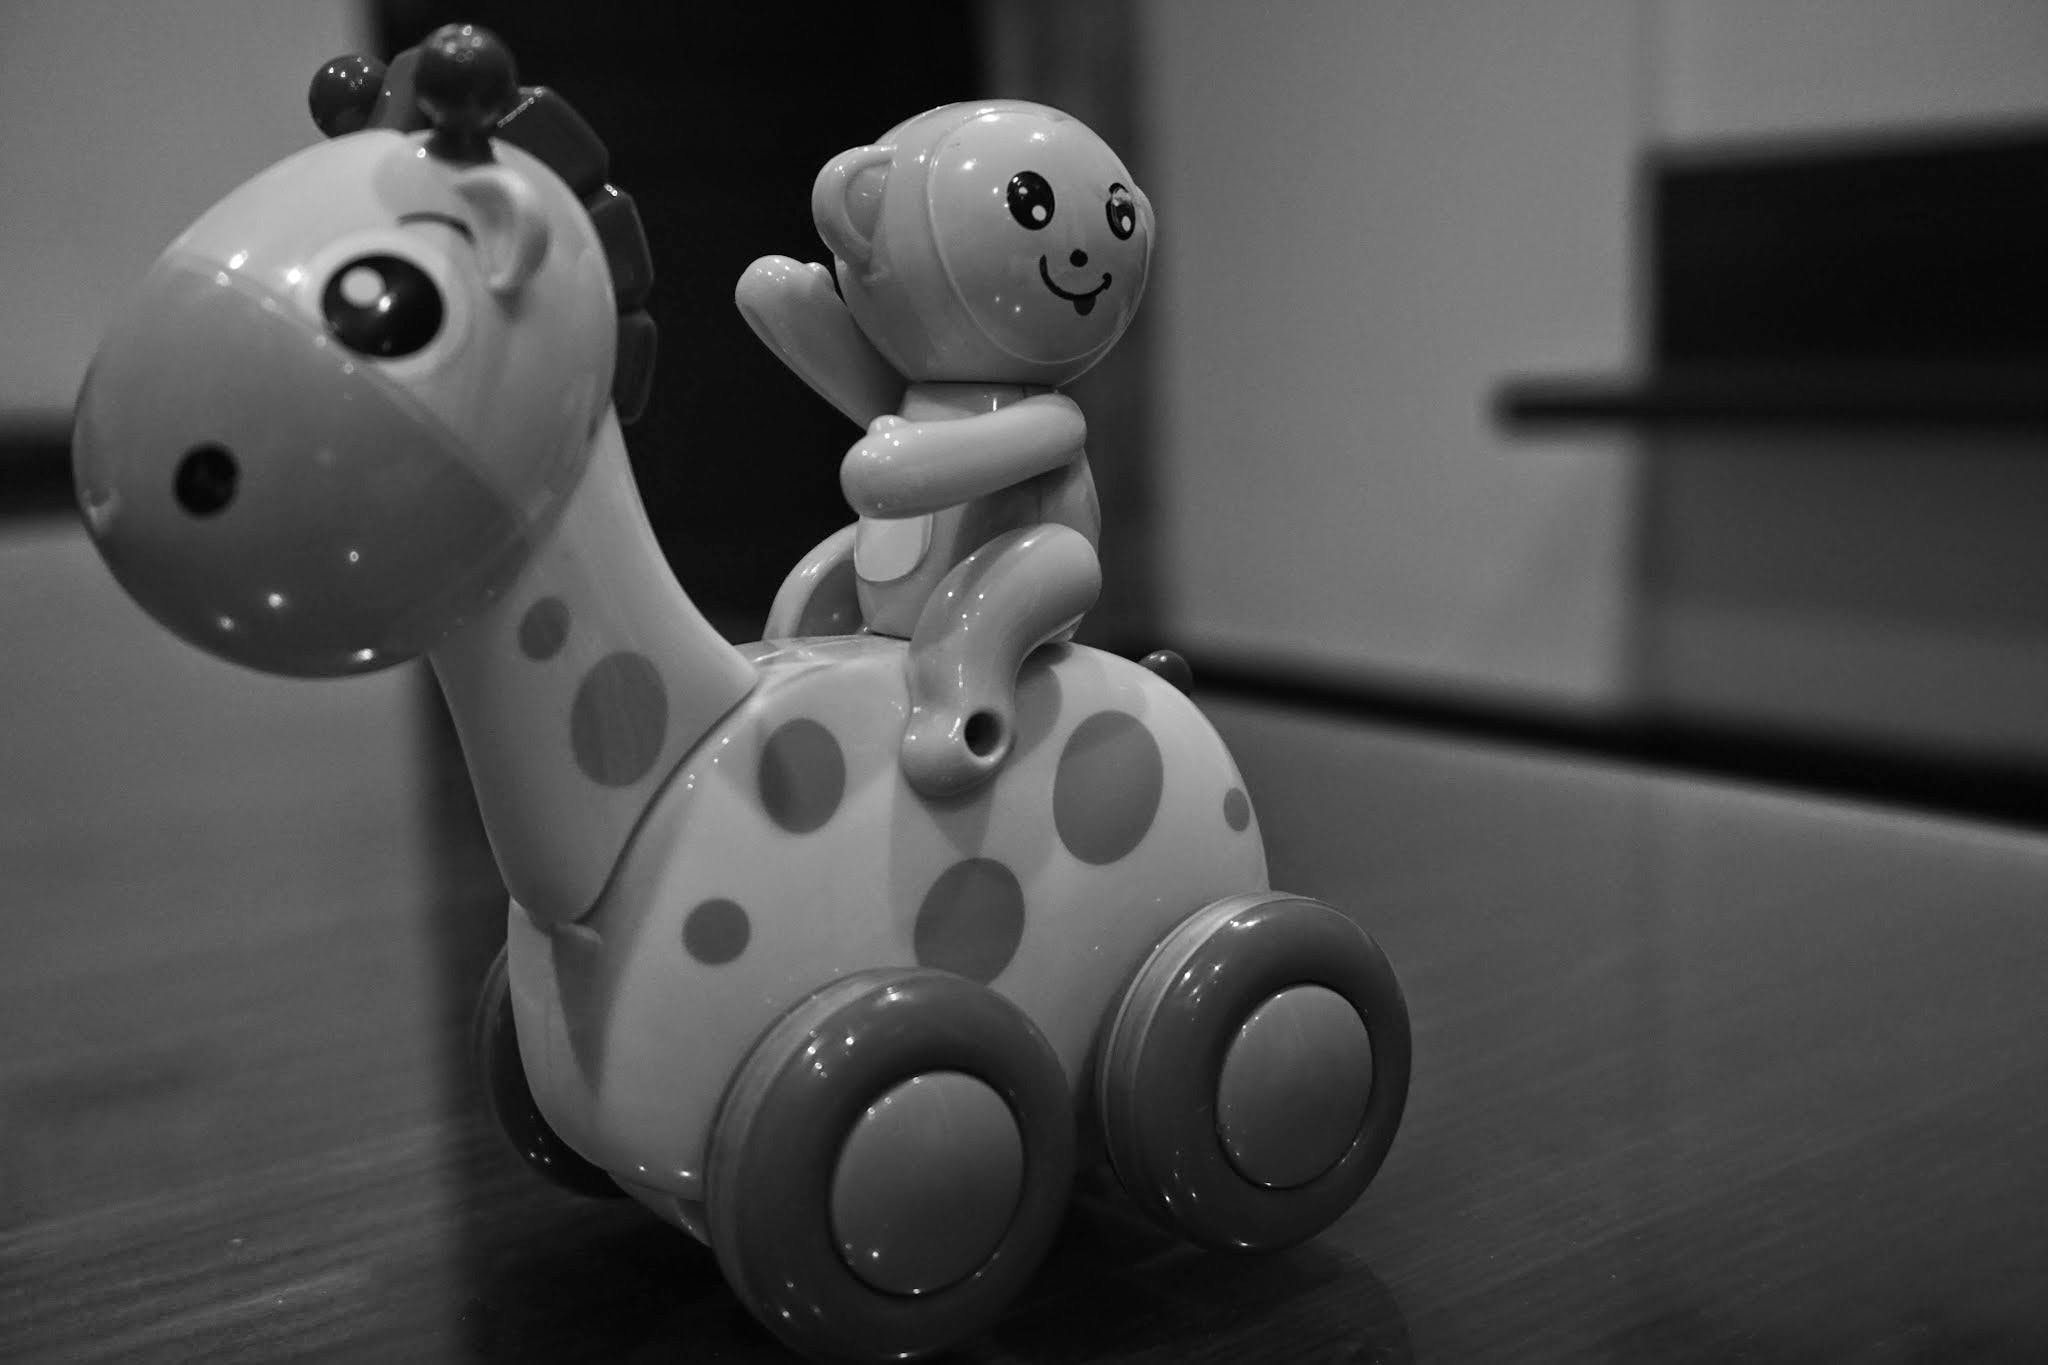 Grayscale Photo of Giraffe and Monkey Plastic Toy on Floor